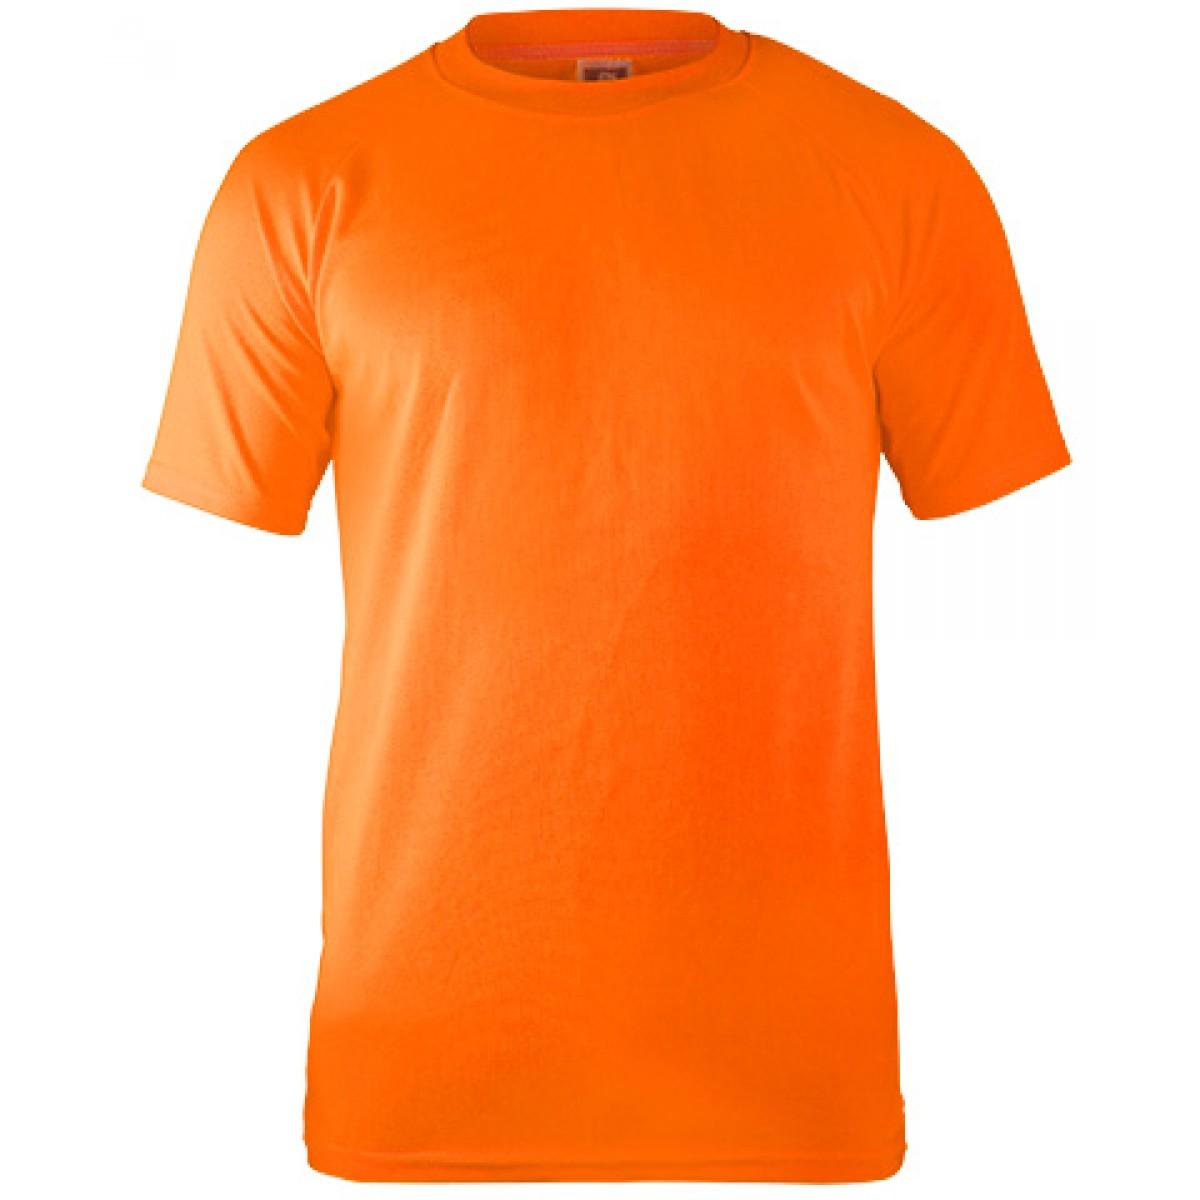 Performance T-shirt-Safety Orange-YL